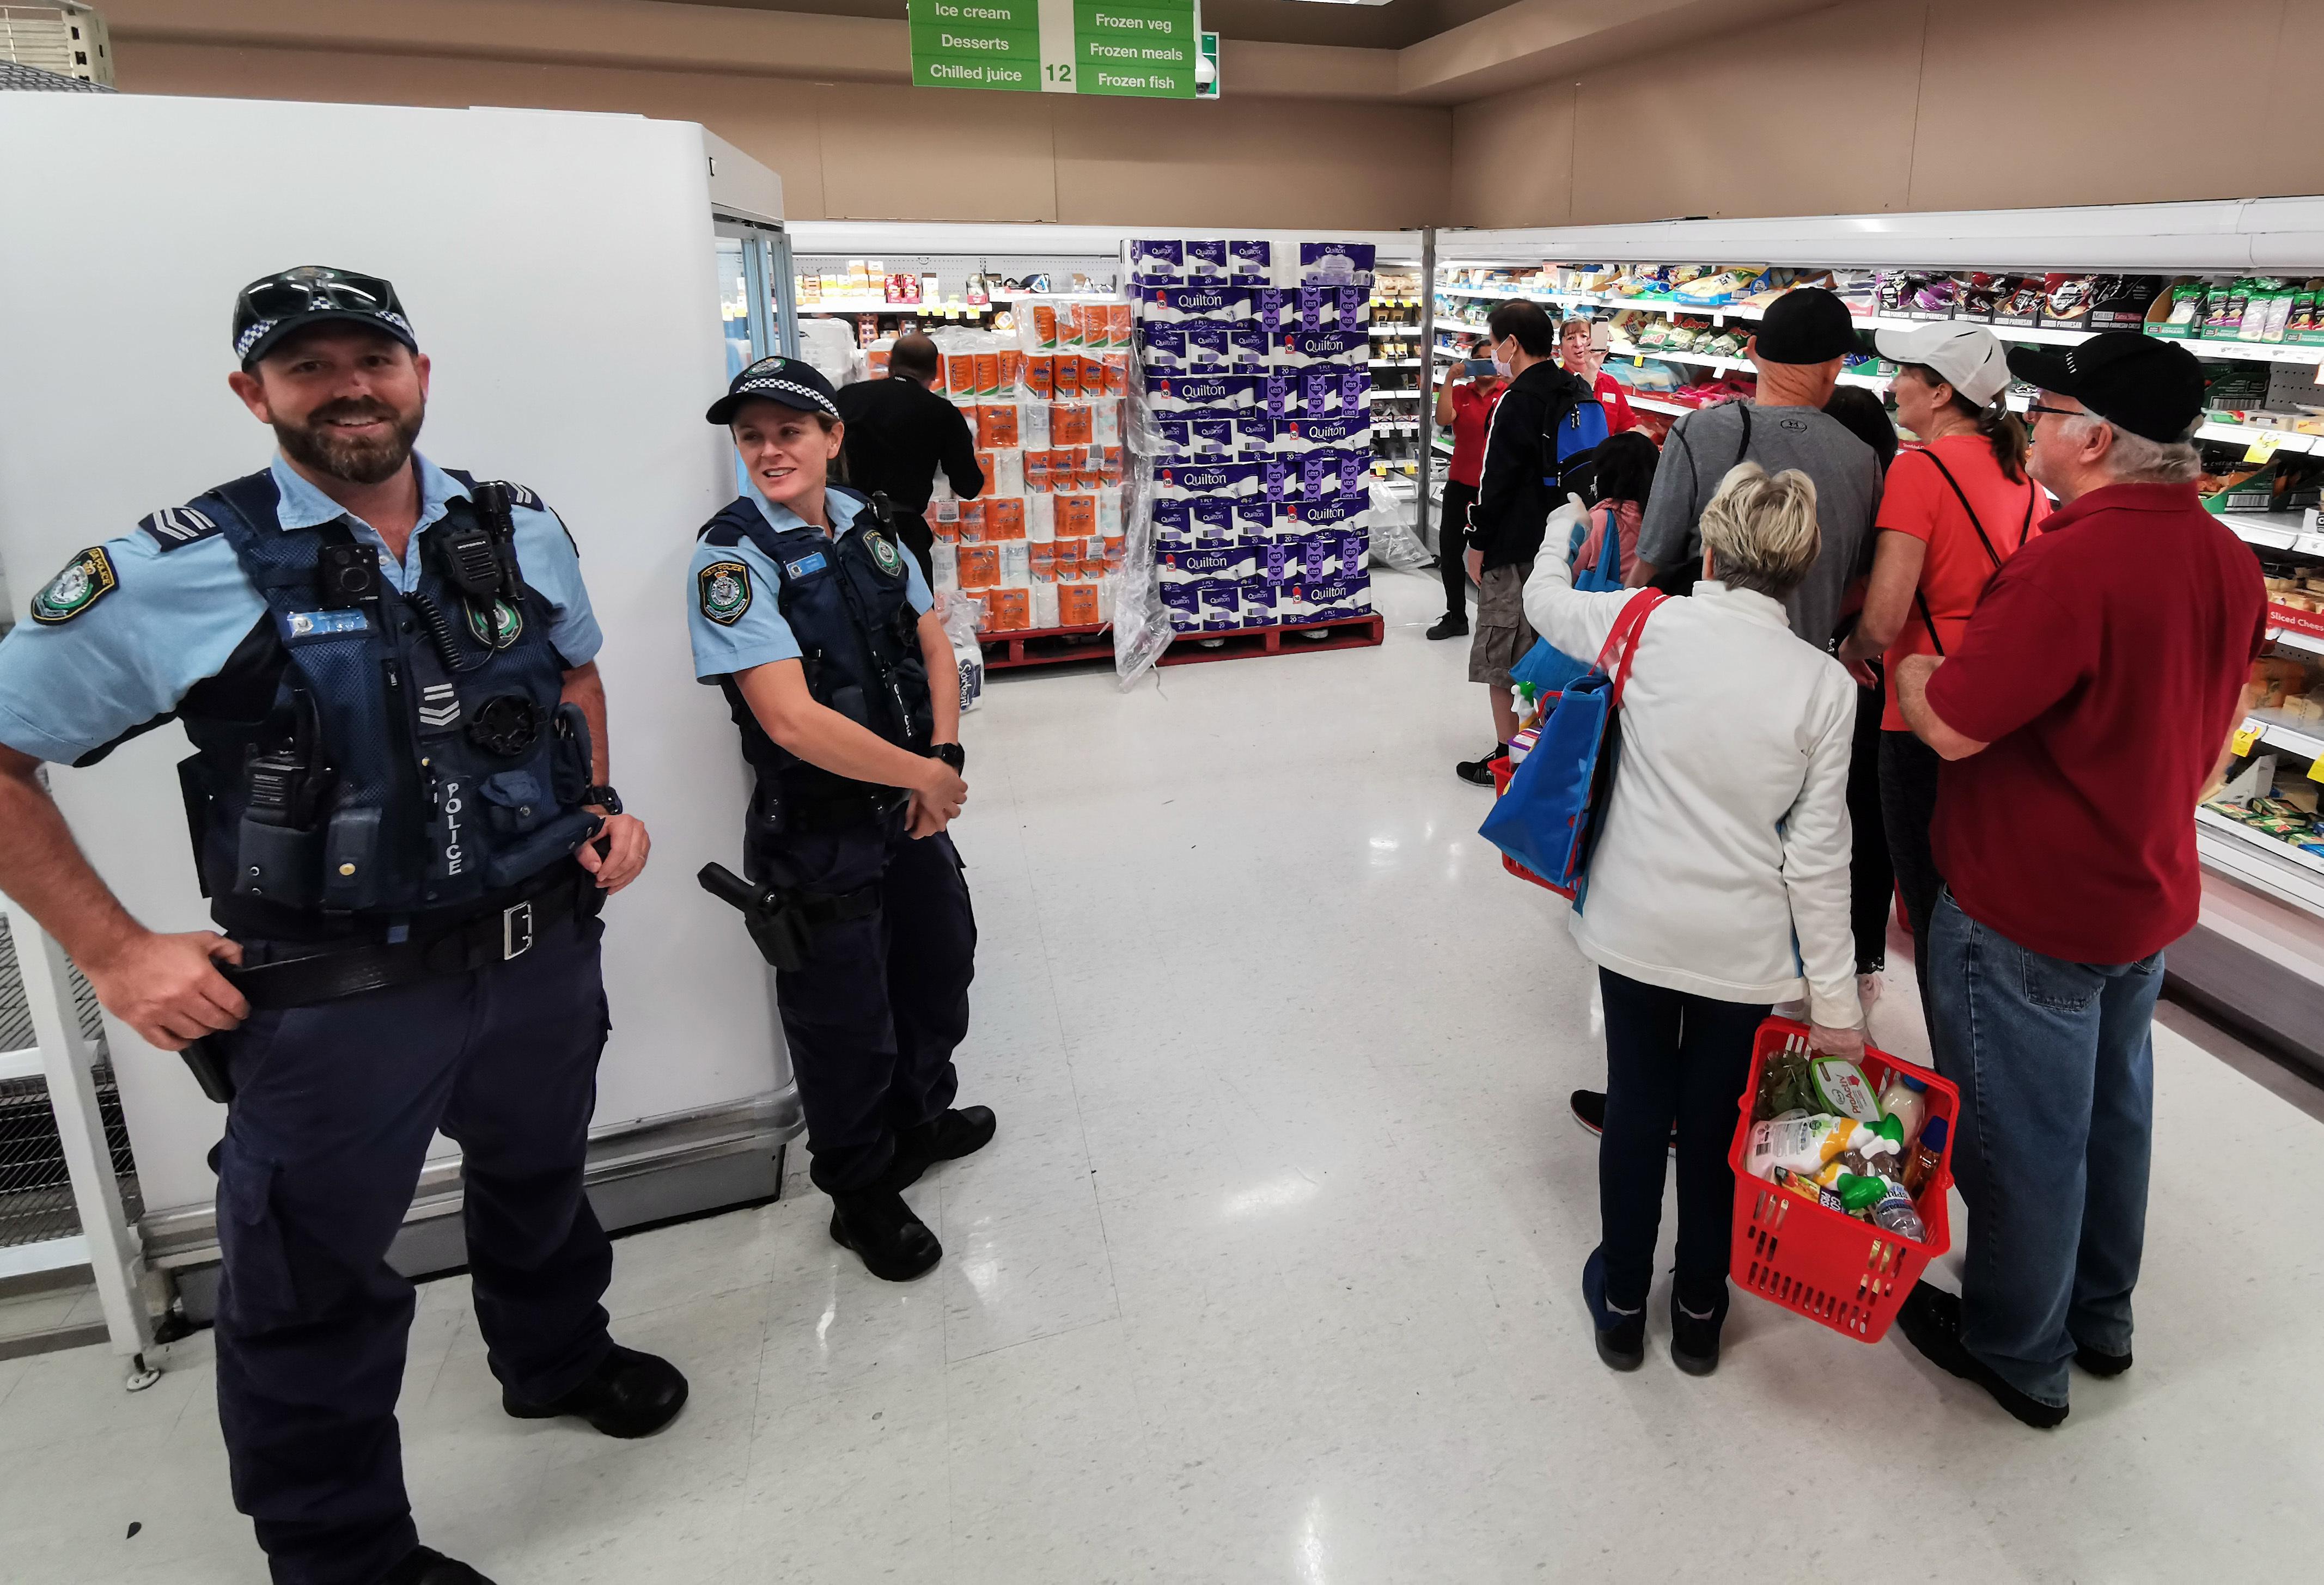 Panic-buying spikes 'record' retail surge